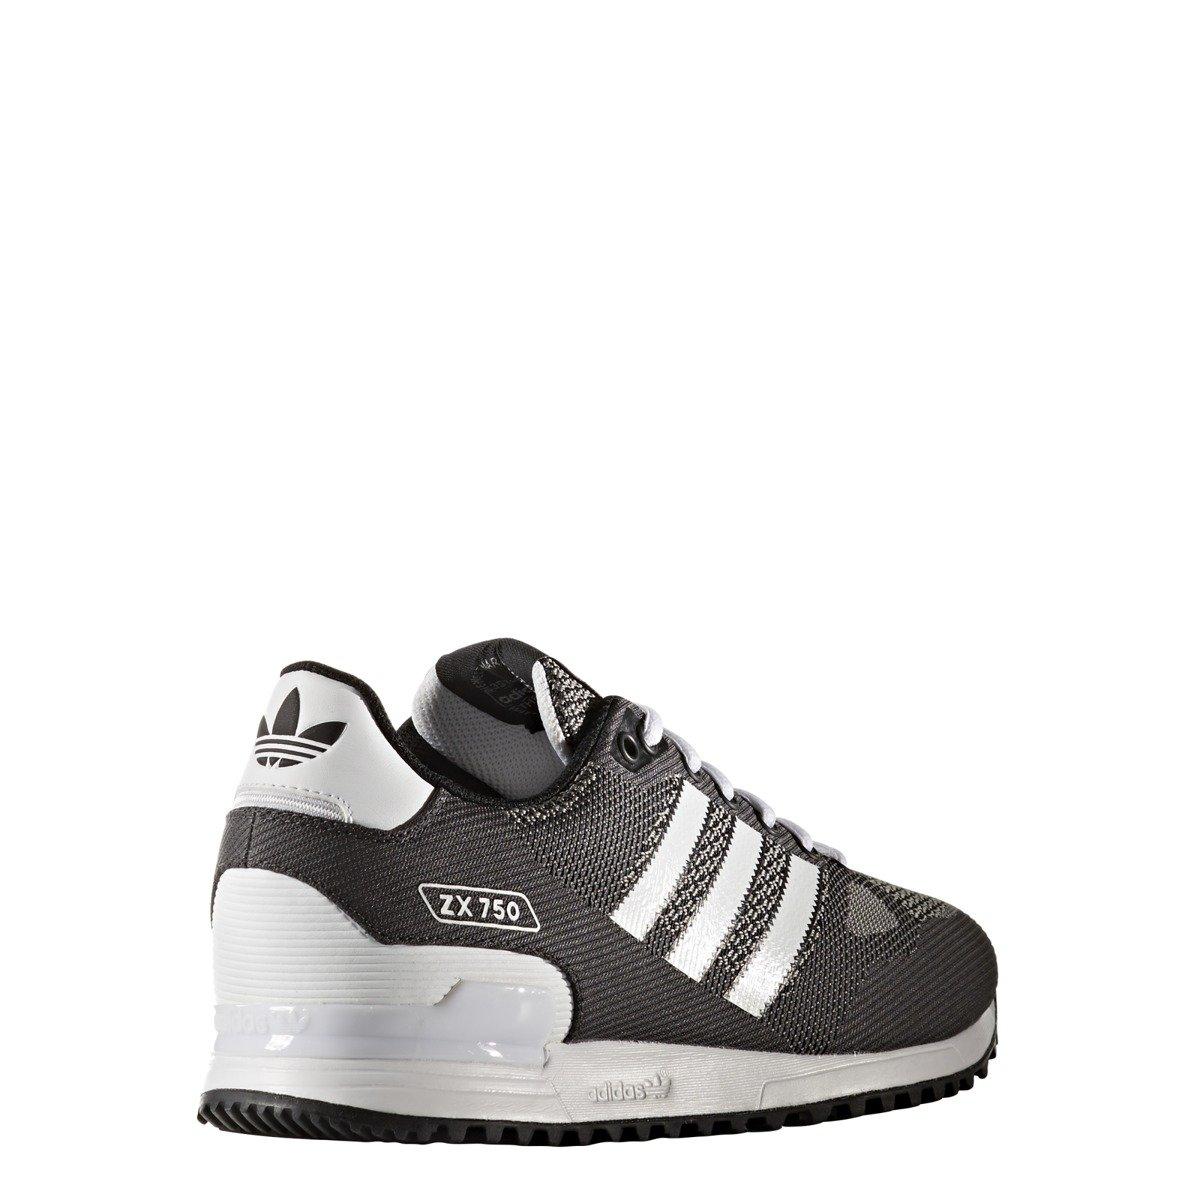 02fe346fbb0a5 ... cheapest adidas zx 750 wv boty bb1222 d9de5 f4761 ...